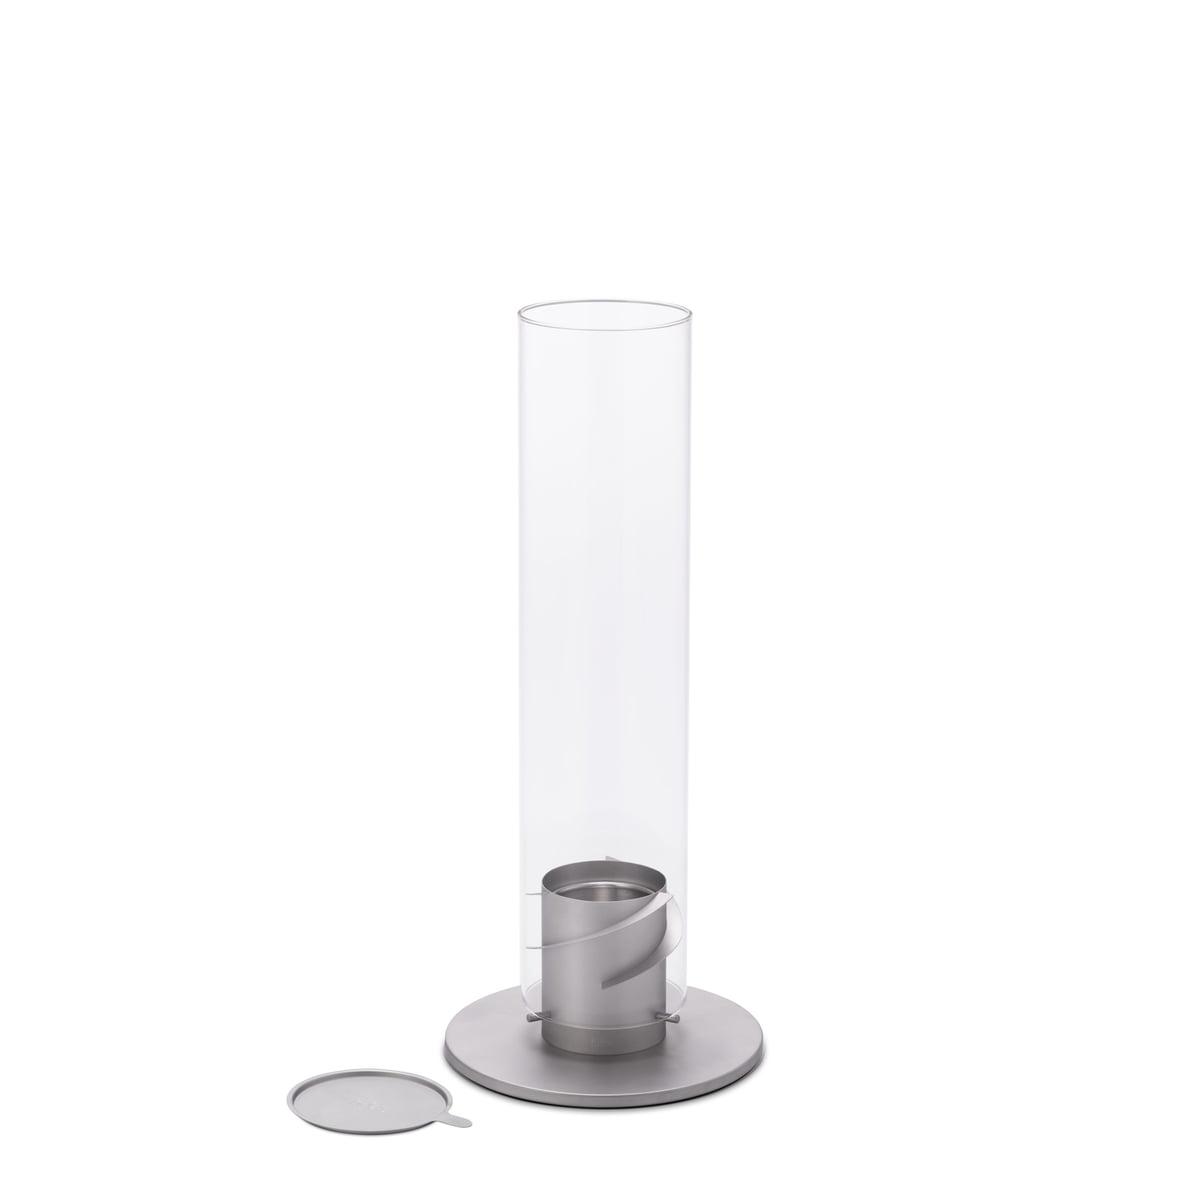 höfats - Spin Tischfeuer 90, grau